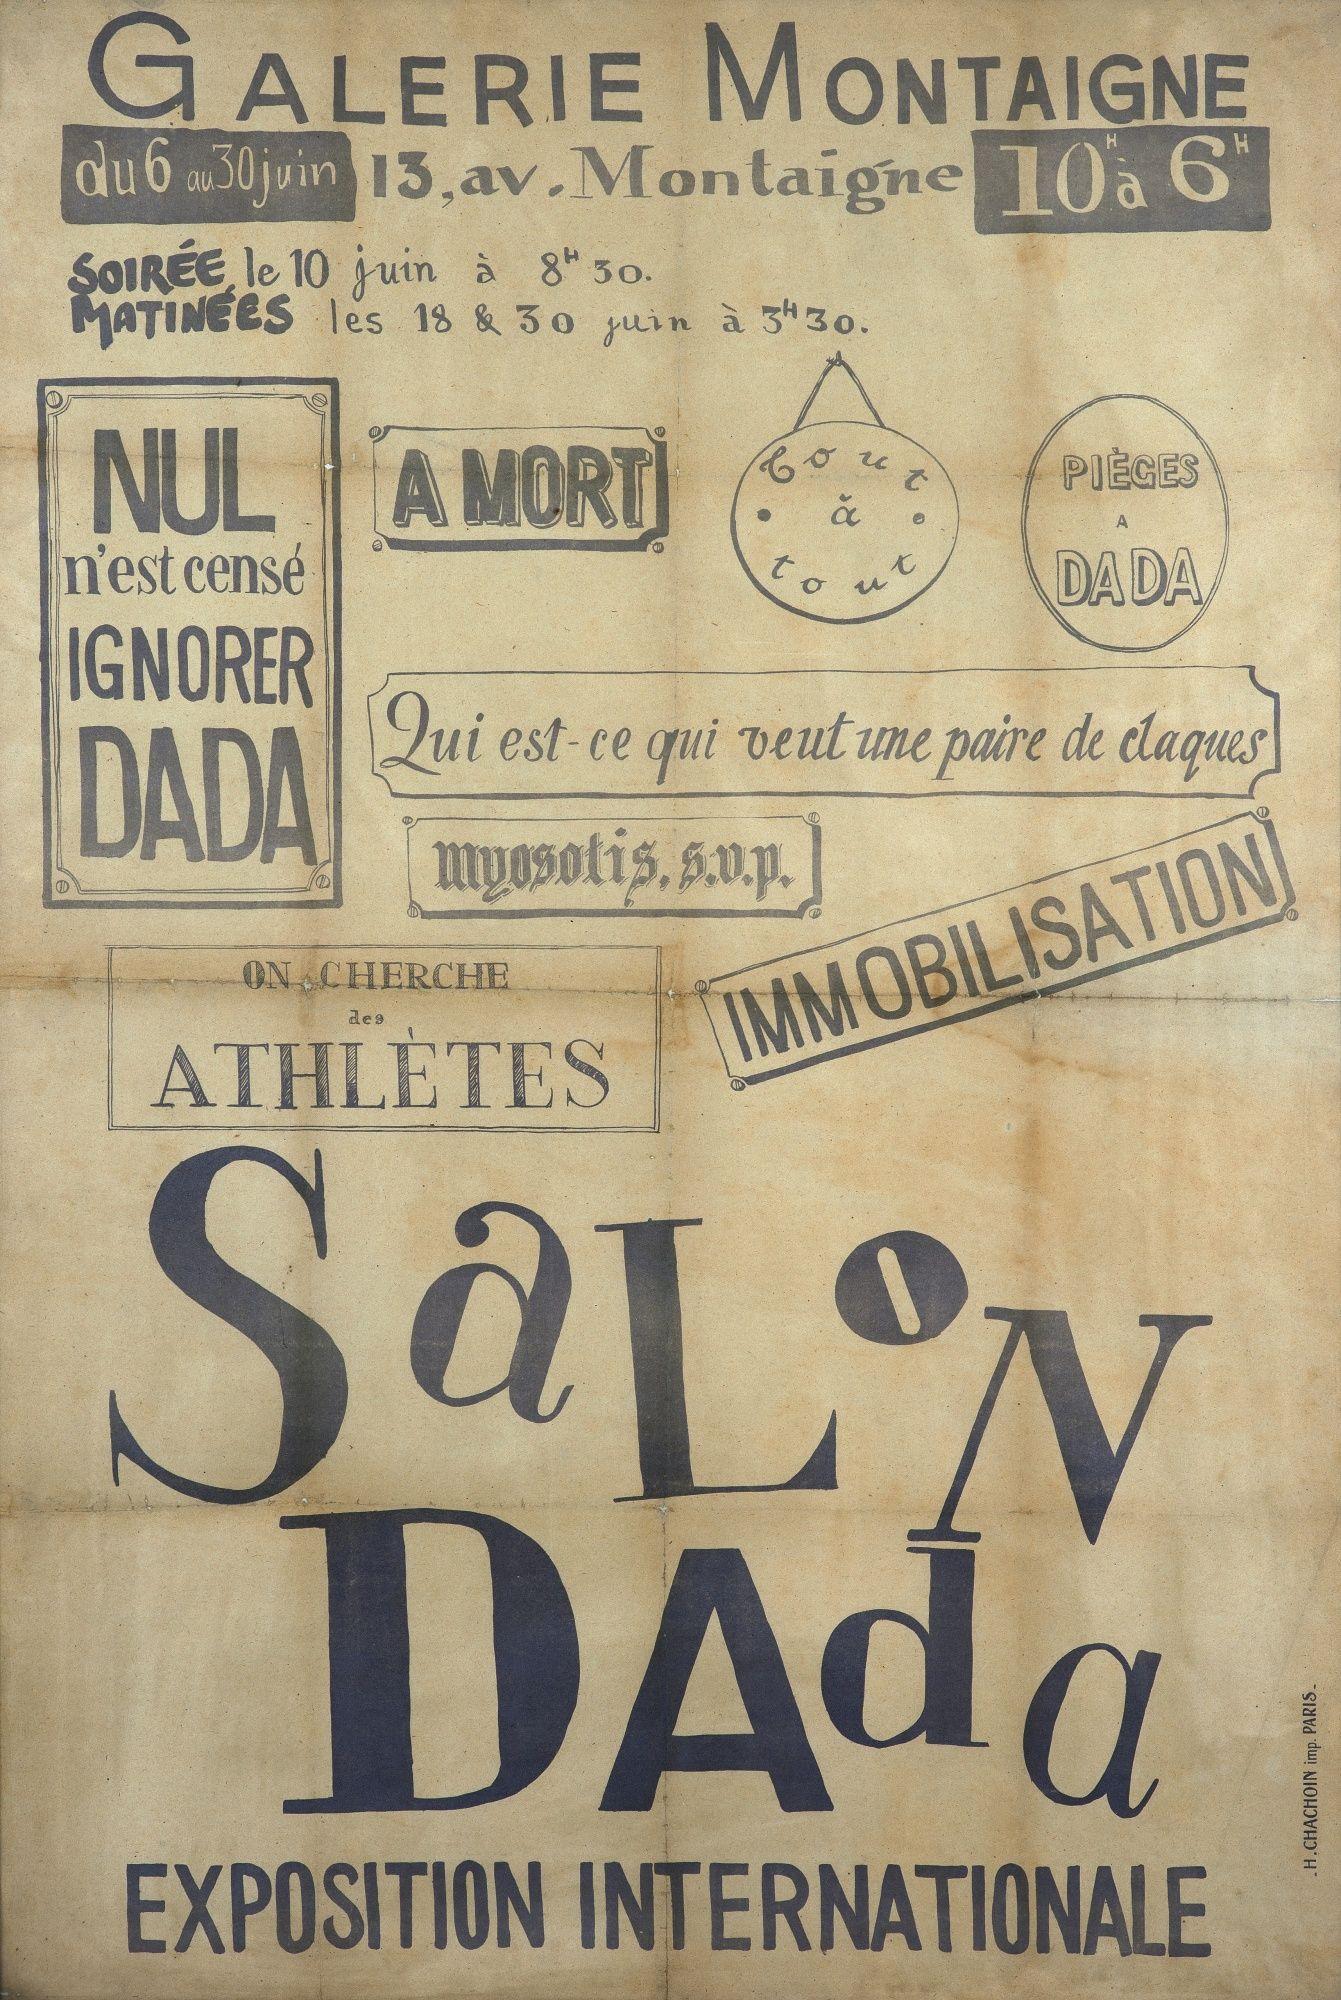 Salon Dada Paris Galerie Montaigne Exposition Internationale 6